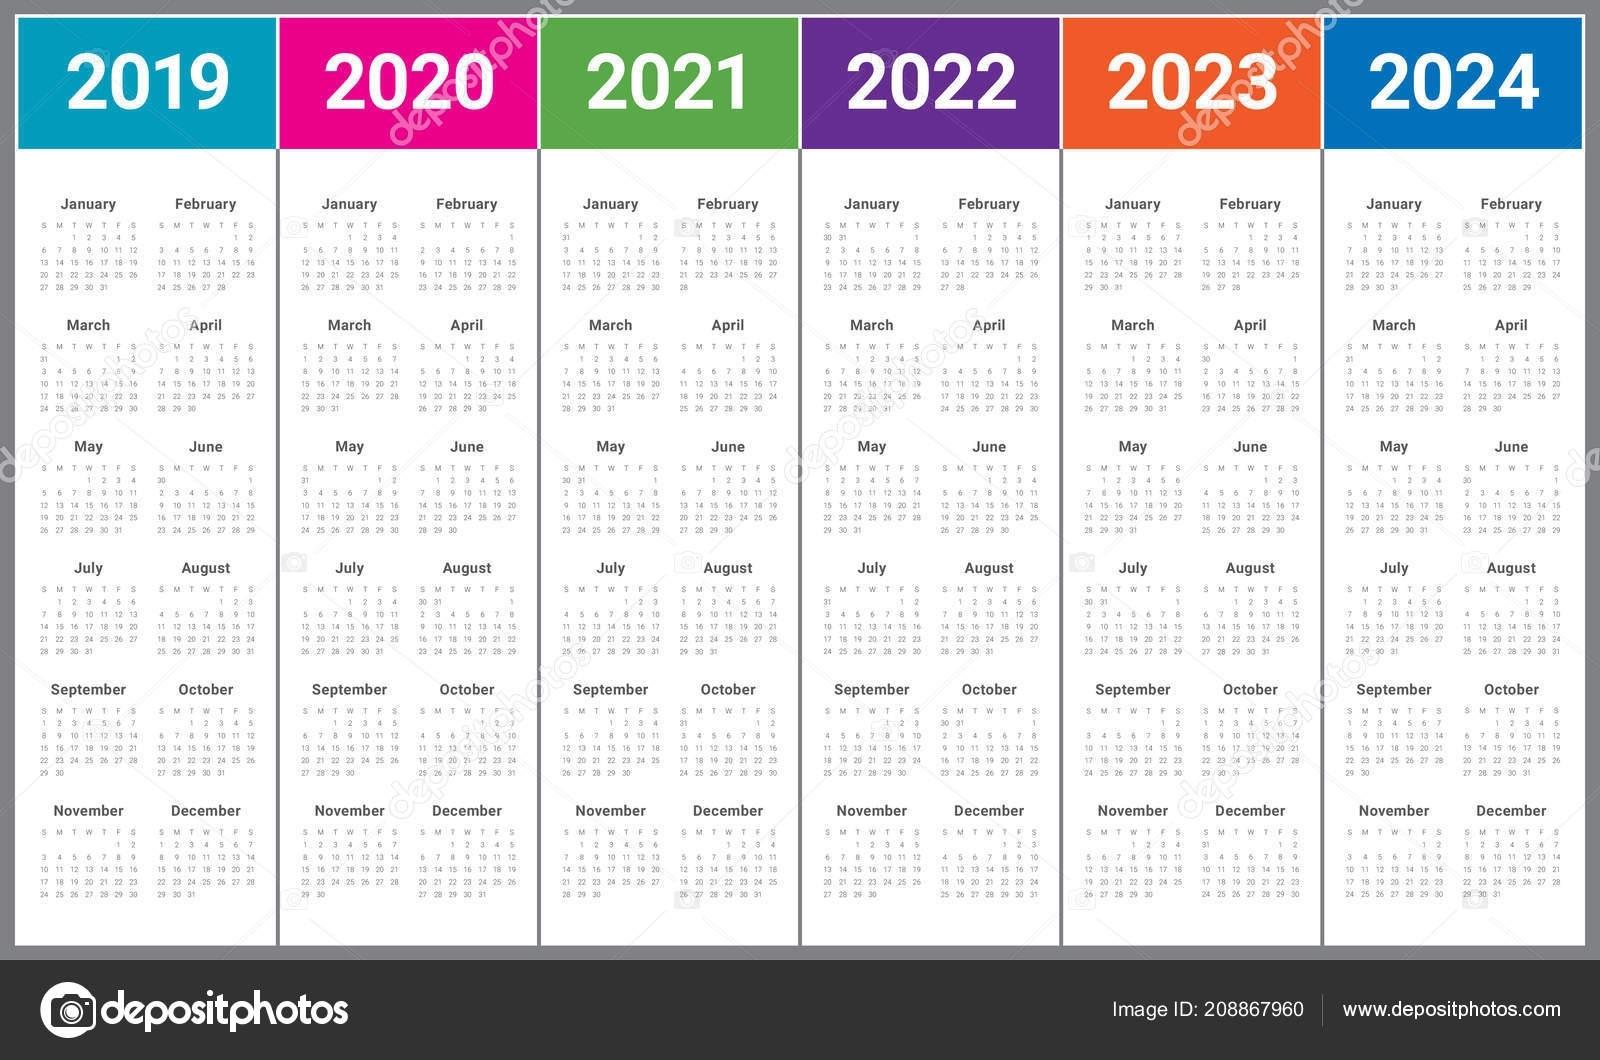 Year 2019 2020 2021 2022 2023 2024 Calendar Vector Design for Calendar Years 2019 2020 2021 2022 2023